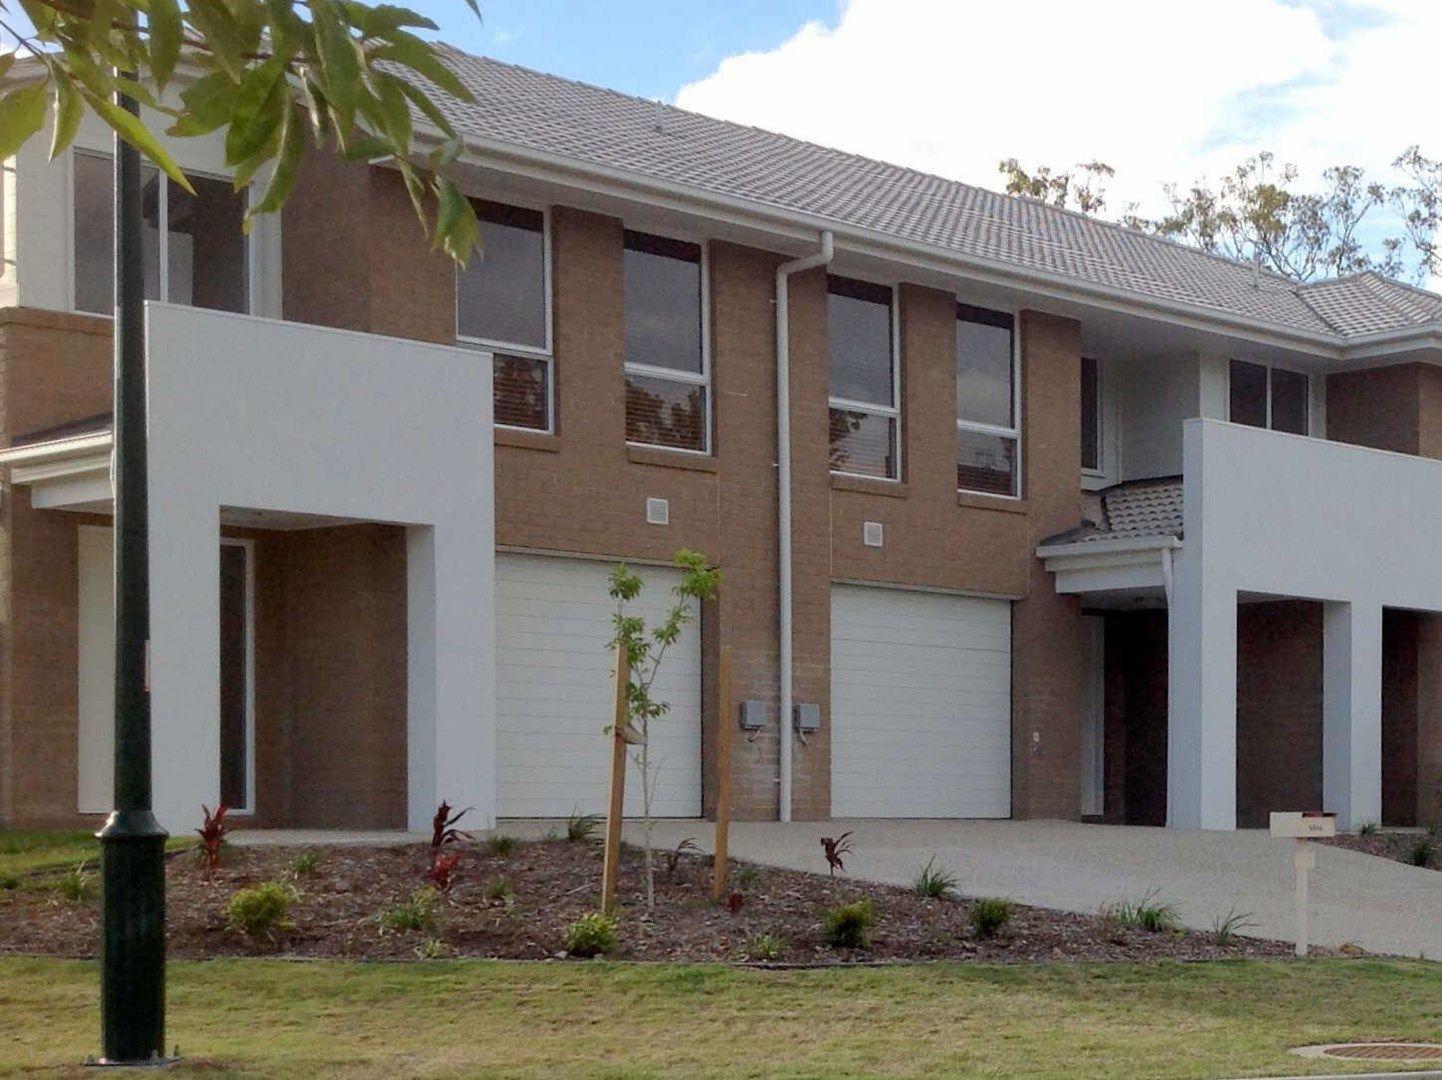 2/22 Christine Drive (Lot 14), Coomera QLD 4209, Image 0